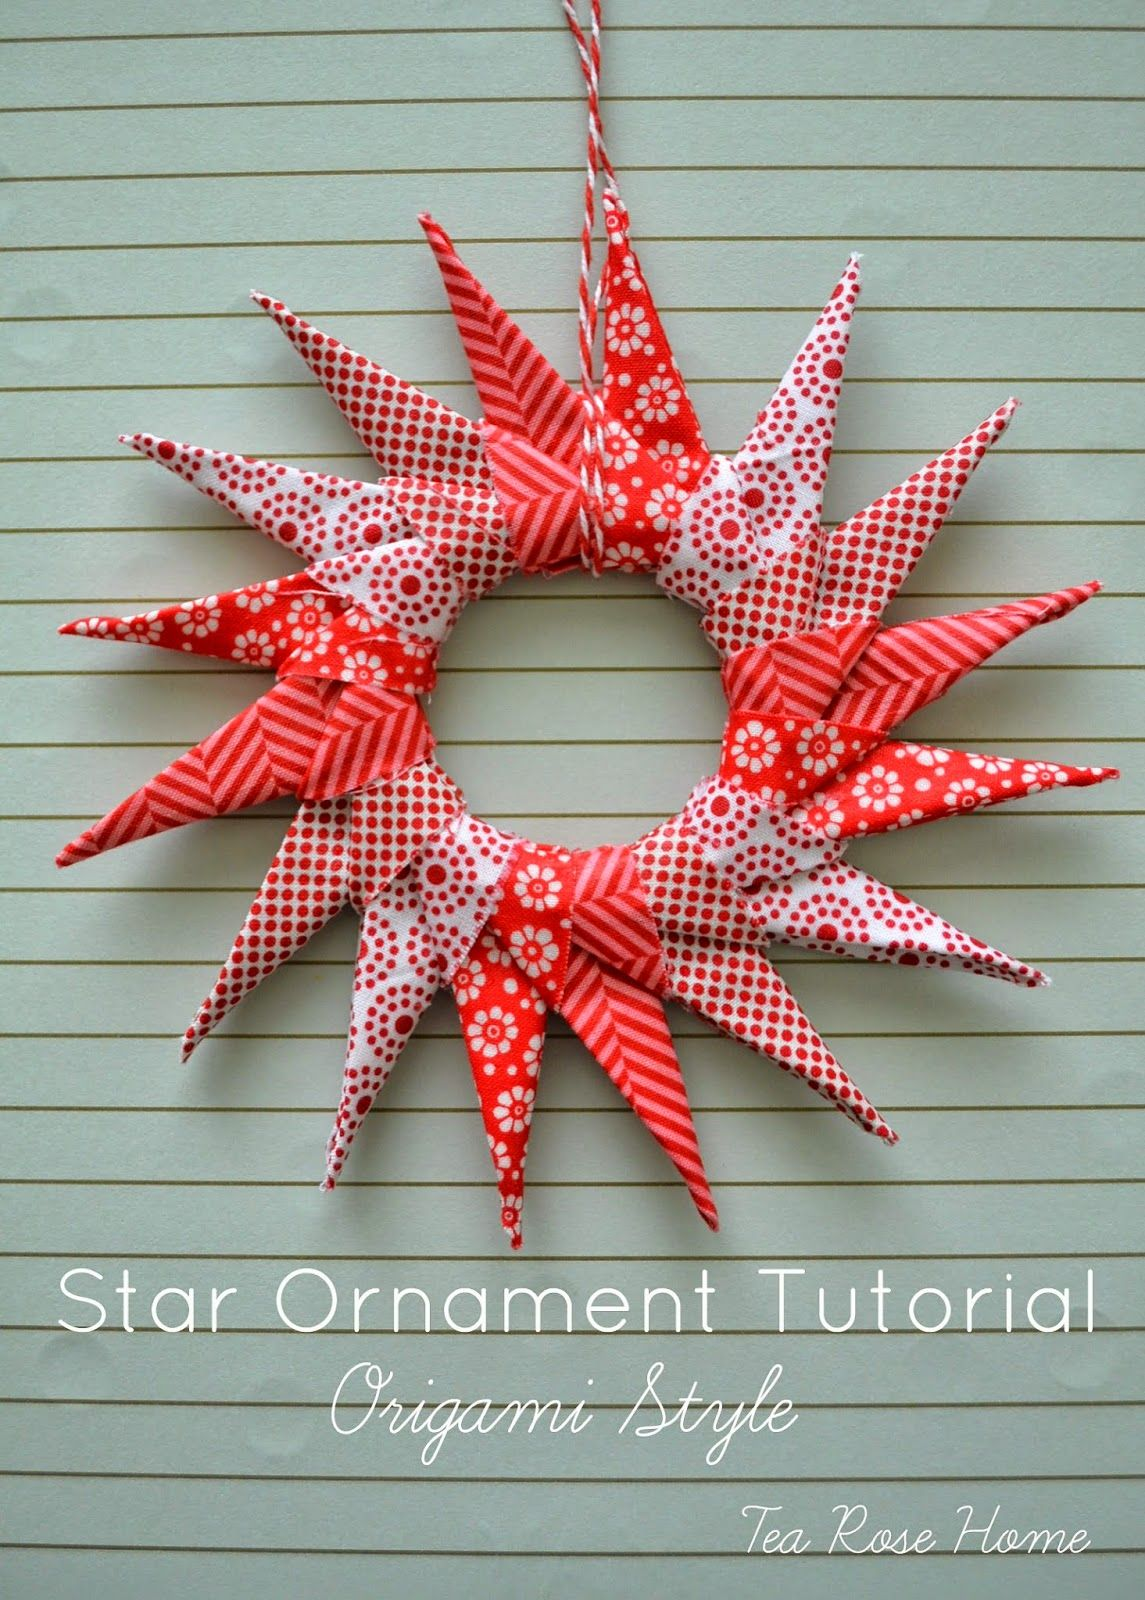 Tea Rose Home Blogging At Ucreate Star Ornament Tutorial Share Handmade Christmas Ornaments Origami Christmas Ornament Sewn Christmas Ornaments